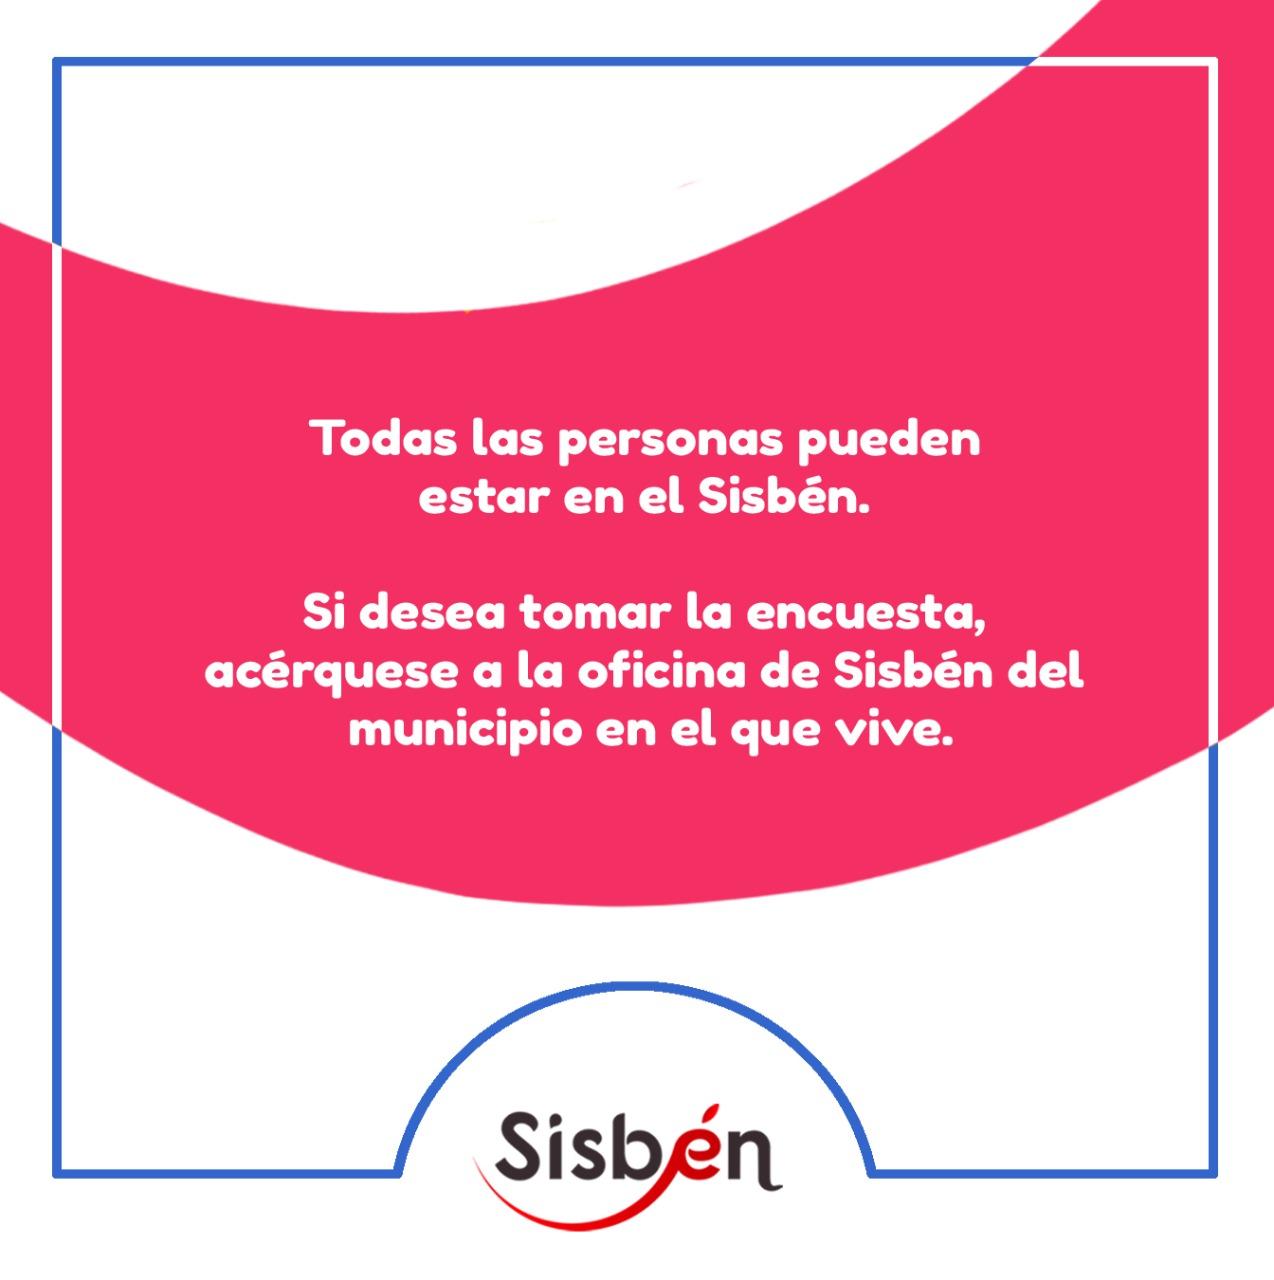 SISBEN